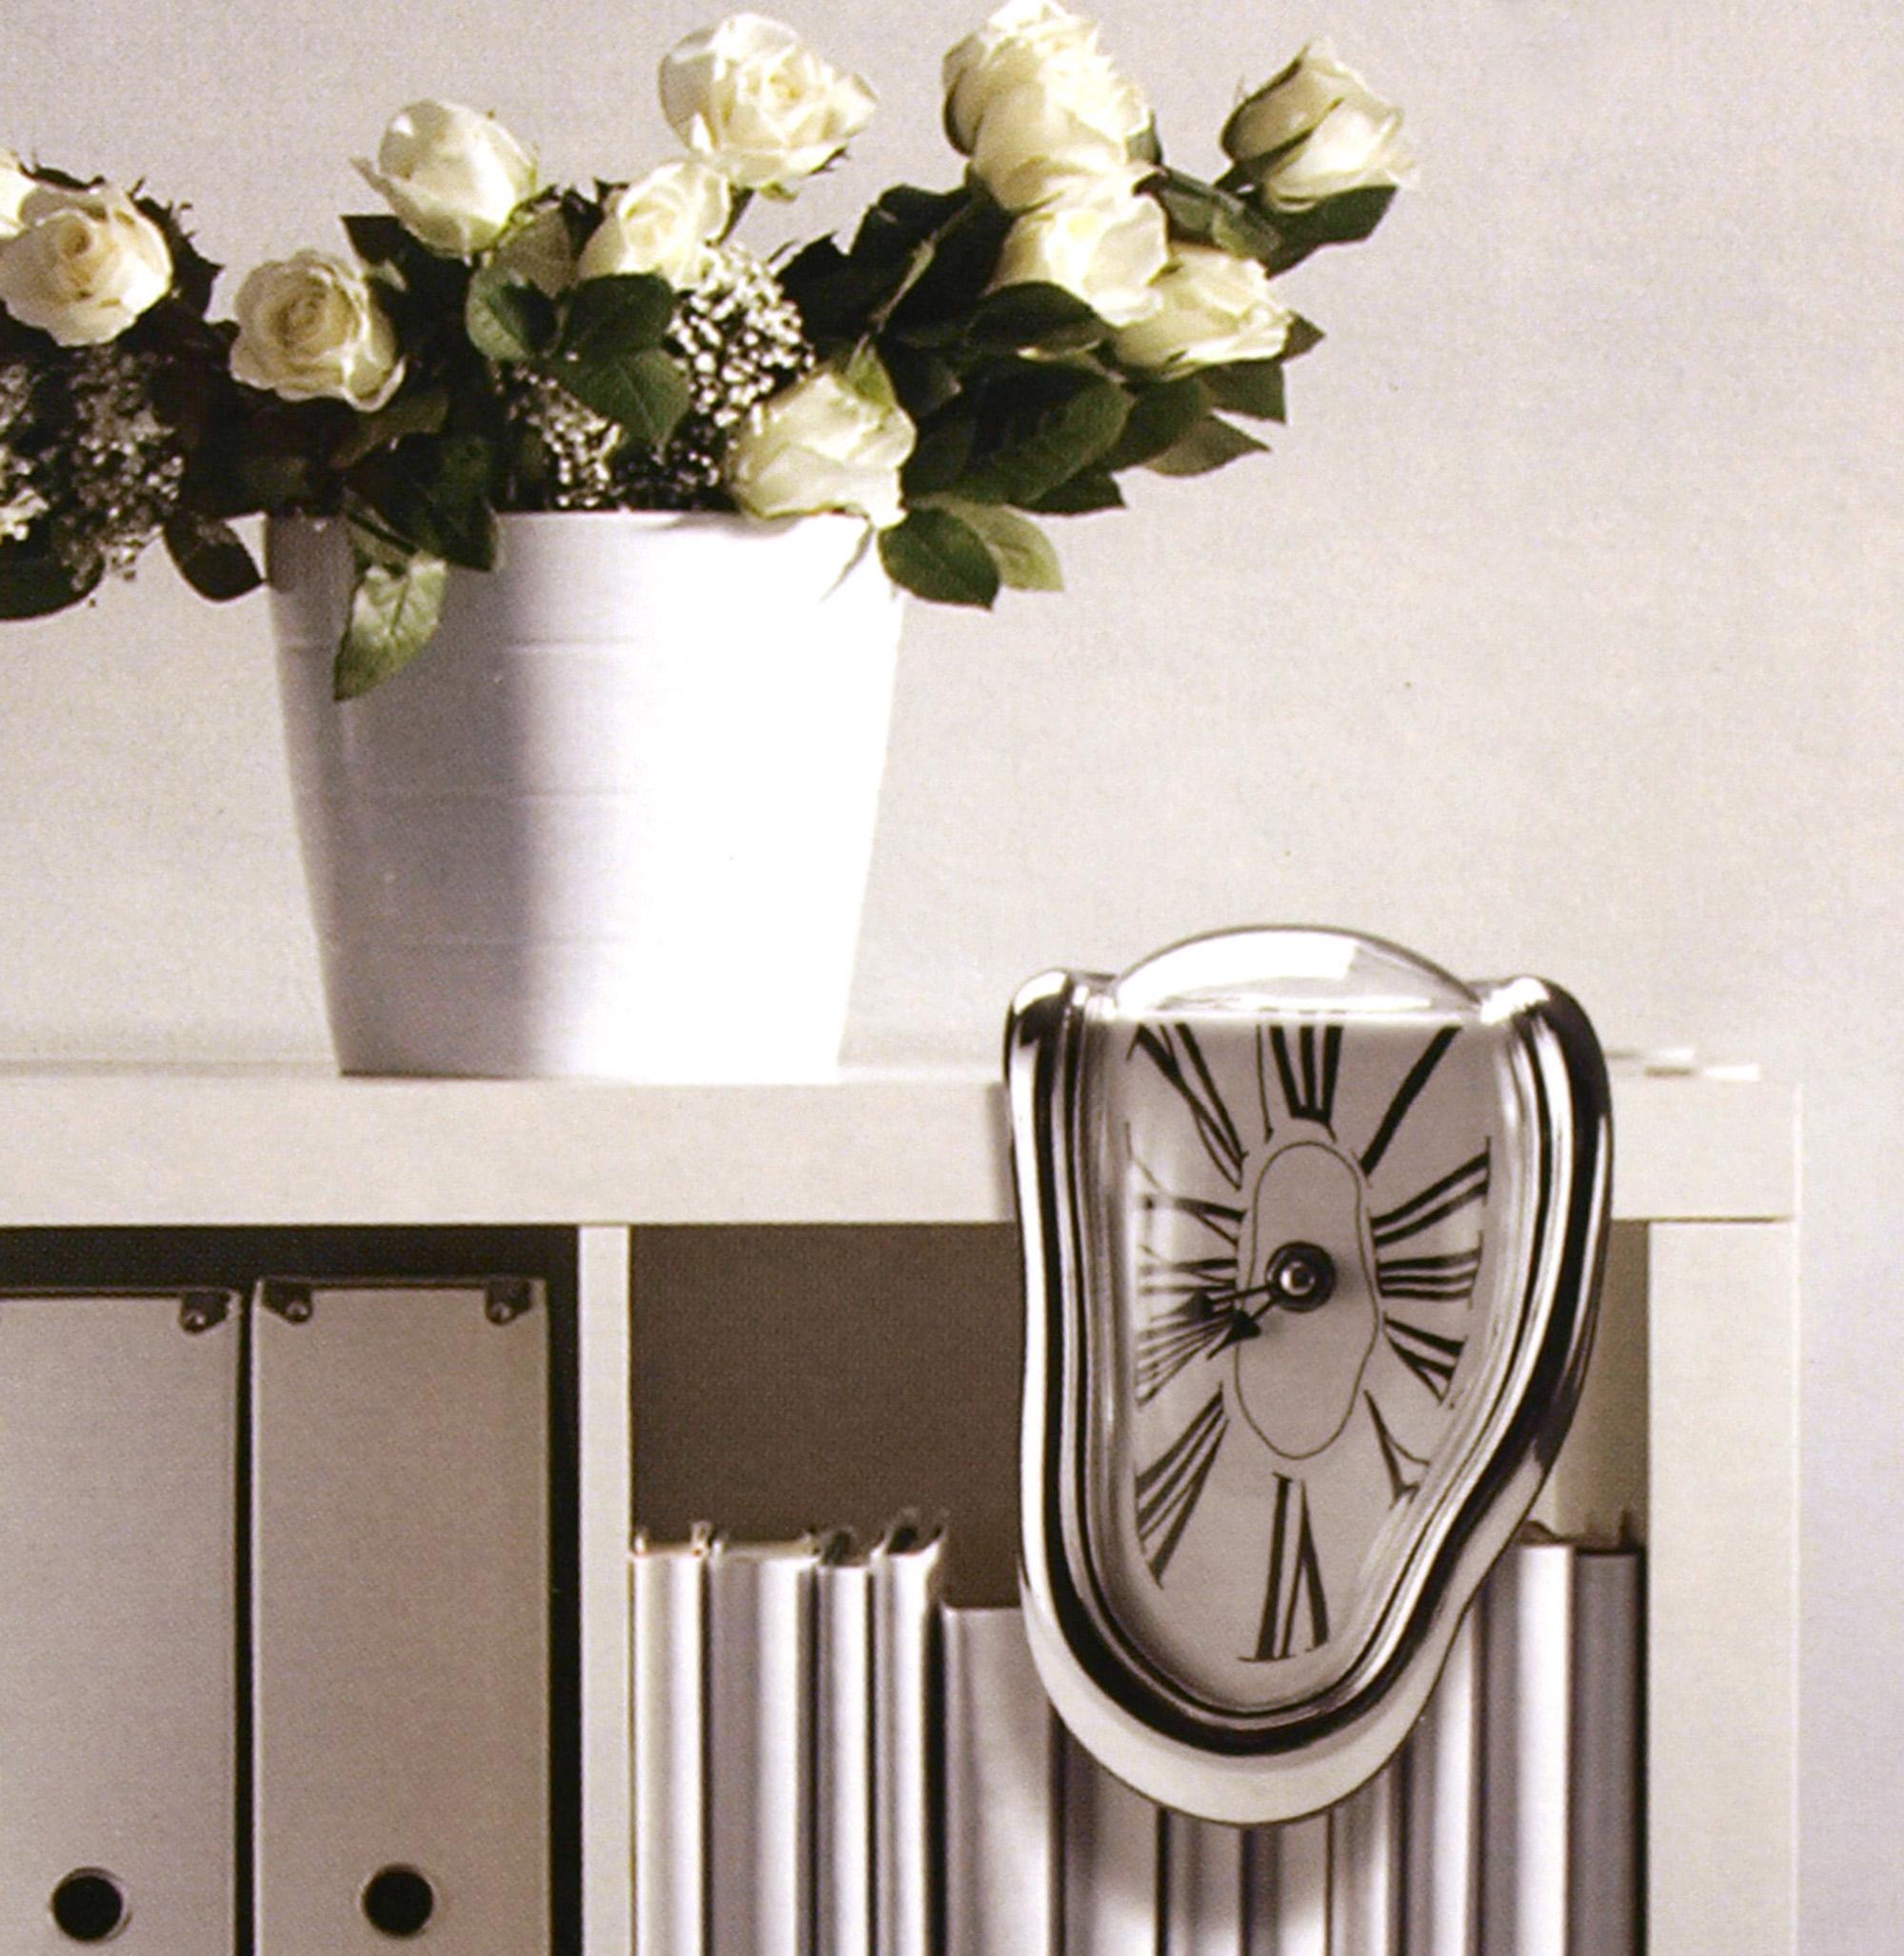 dali fondant horloge surr aliste psych d lique d coration ebay. Black Bedroom Furniture Sets. Home Design Ideas